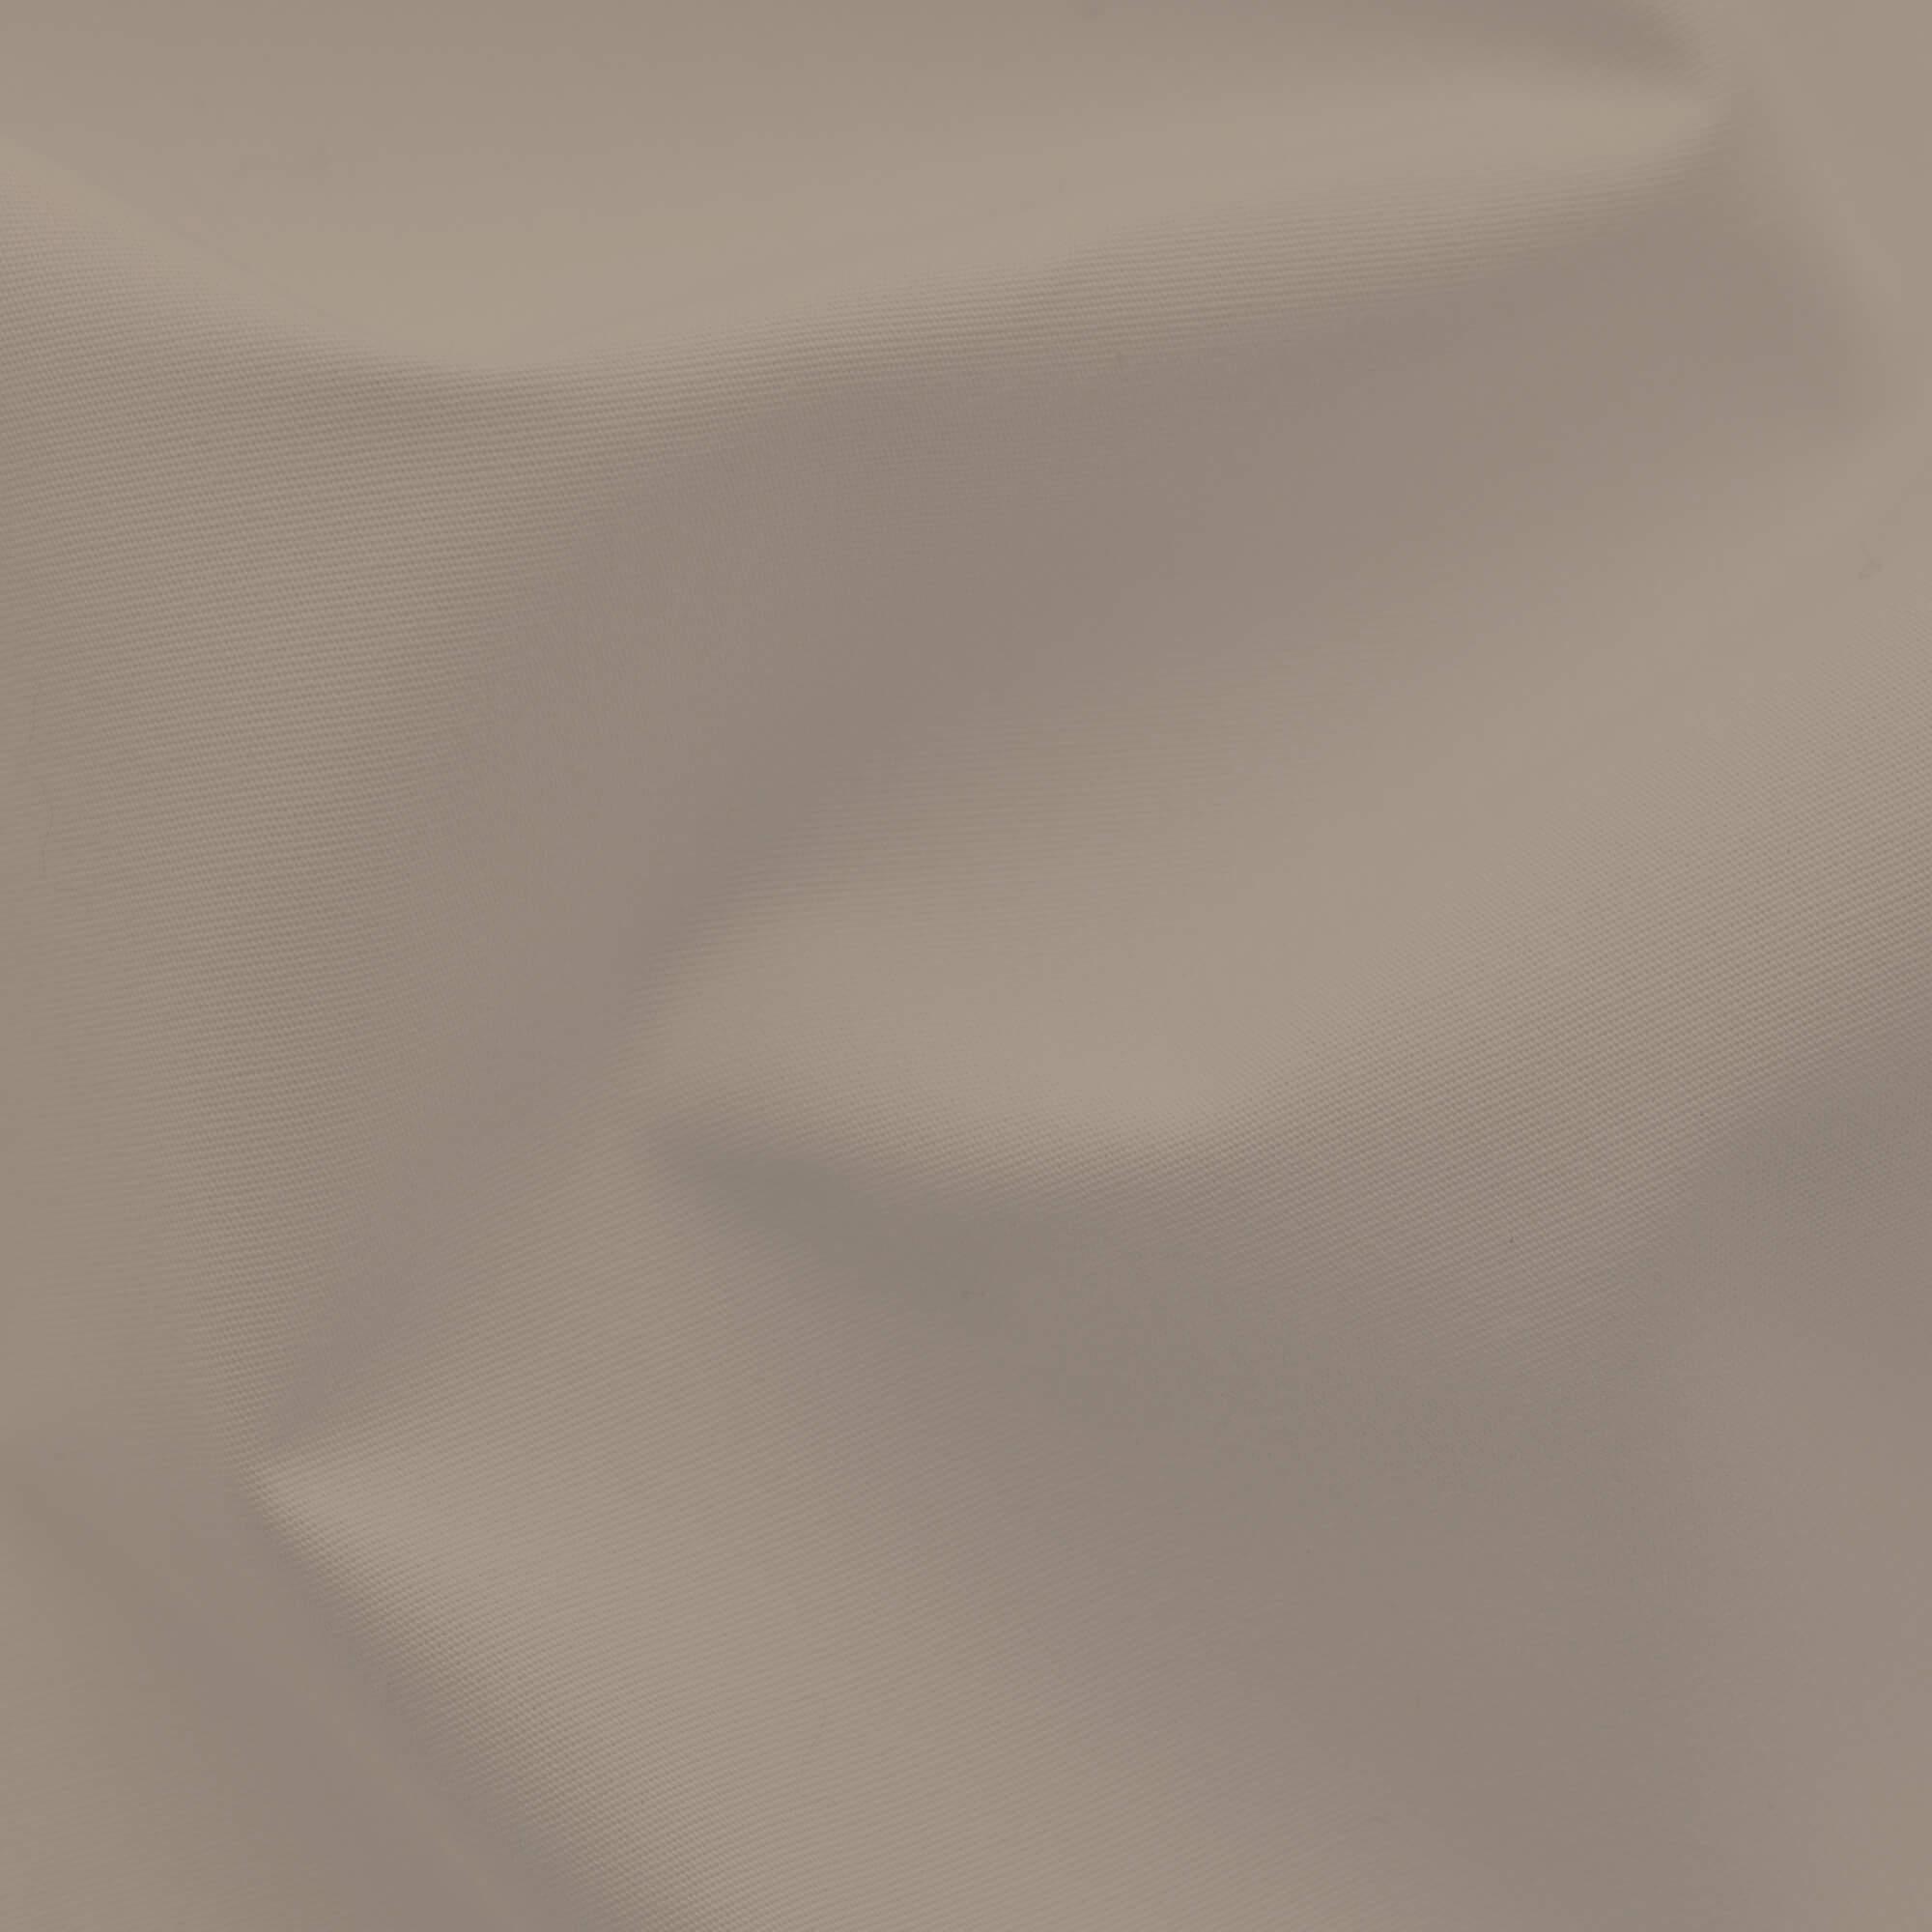 taupes Spannbettlaken Perkal aus Baumwolle